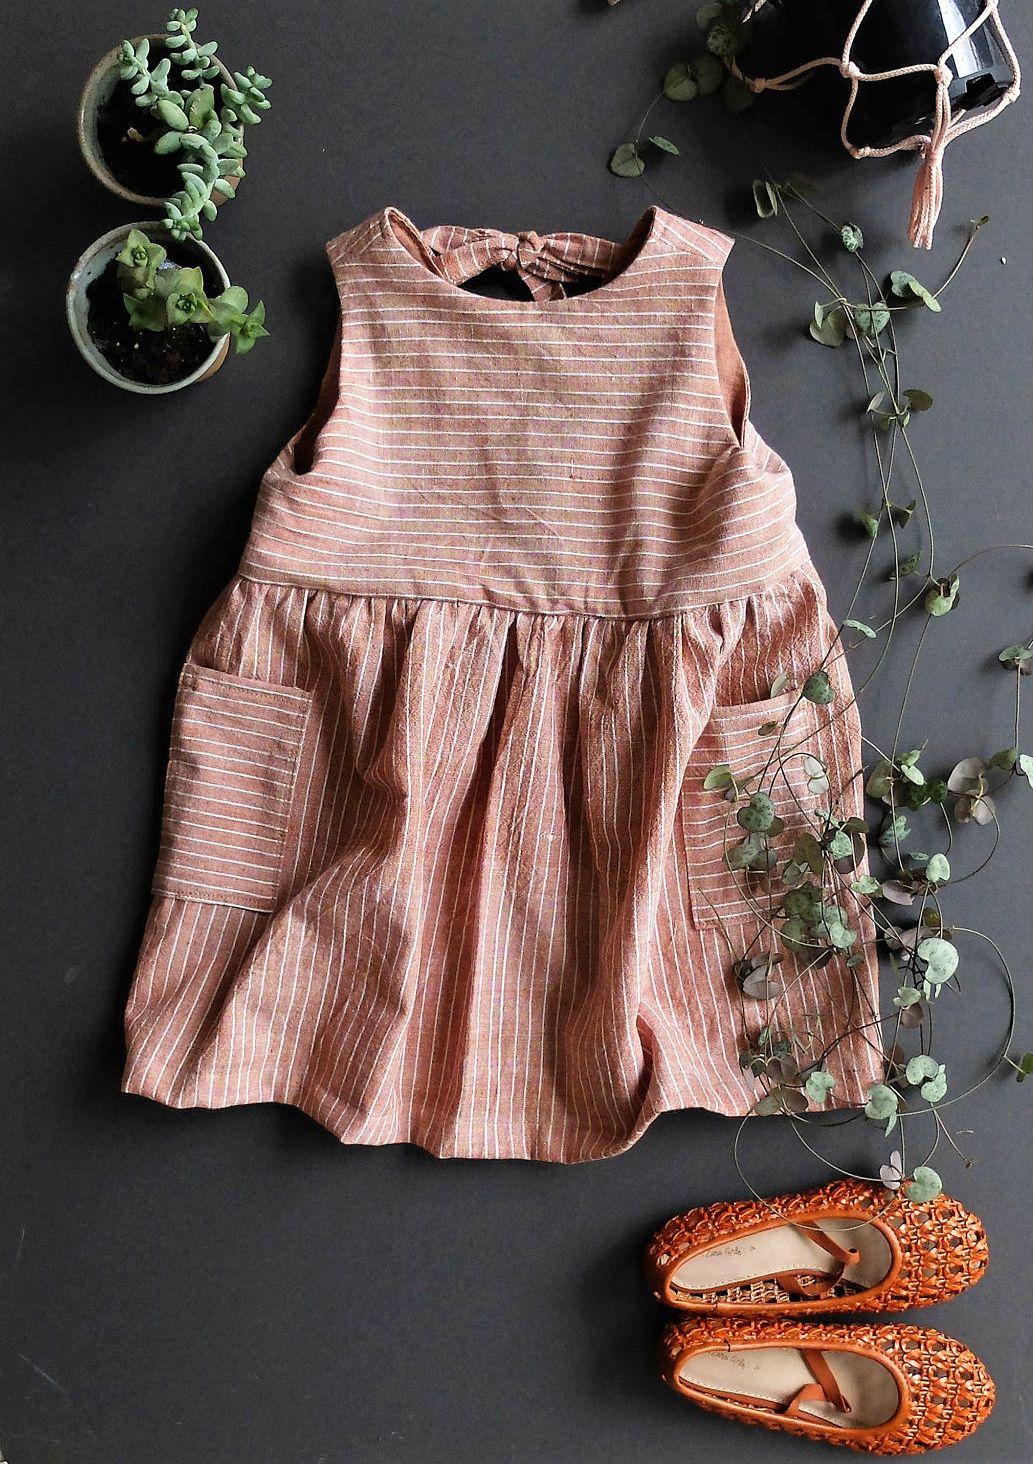 Beautiful Handmade Cotton Pocket Dress  YouAreSmall on Etsy